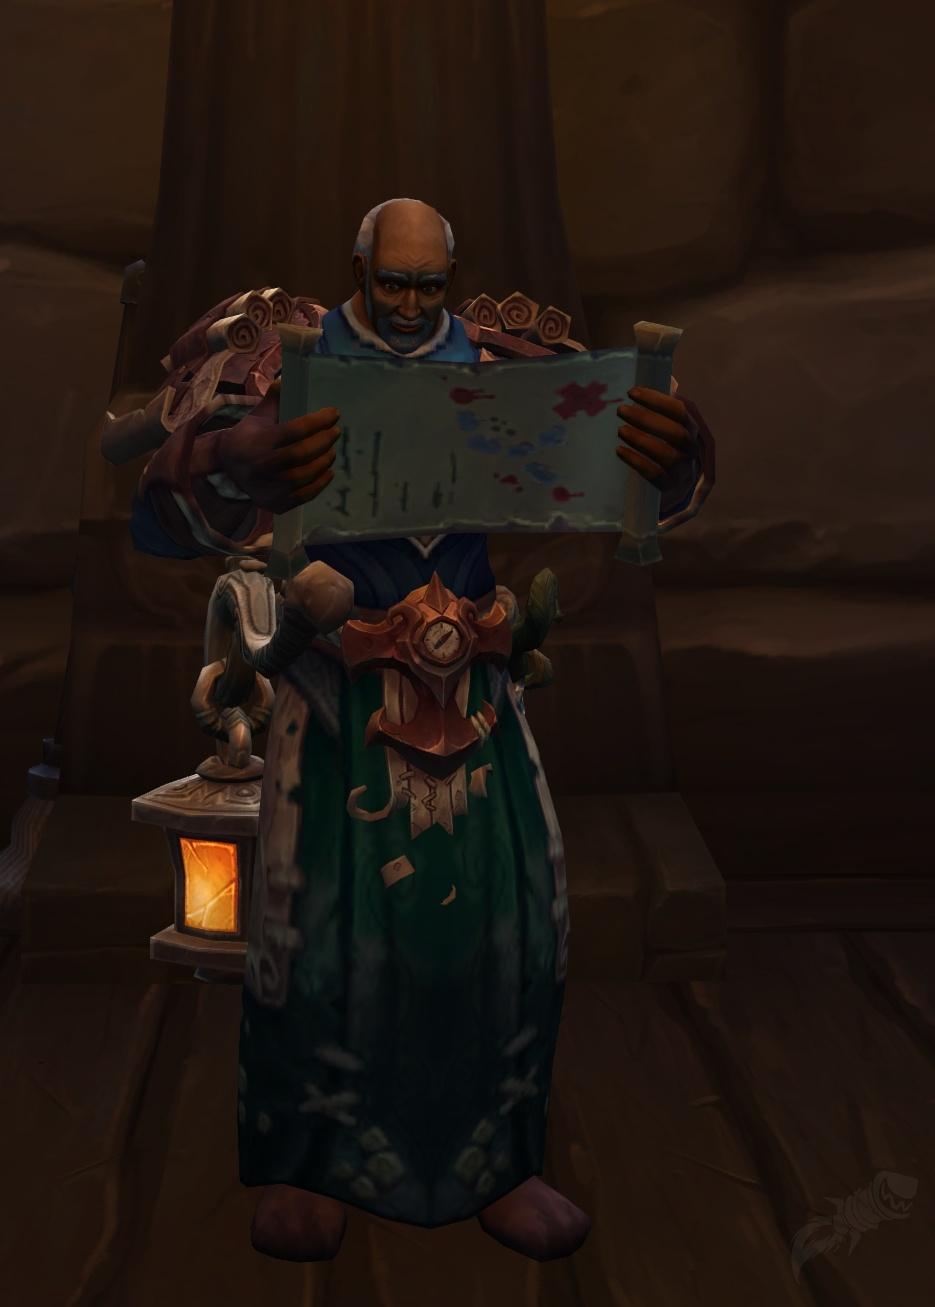 Son Oeil Noir Vous Regarde Wow : regarde, Frère, World, Warcraft